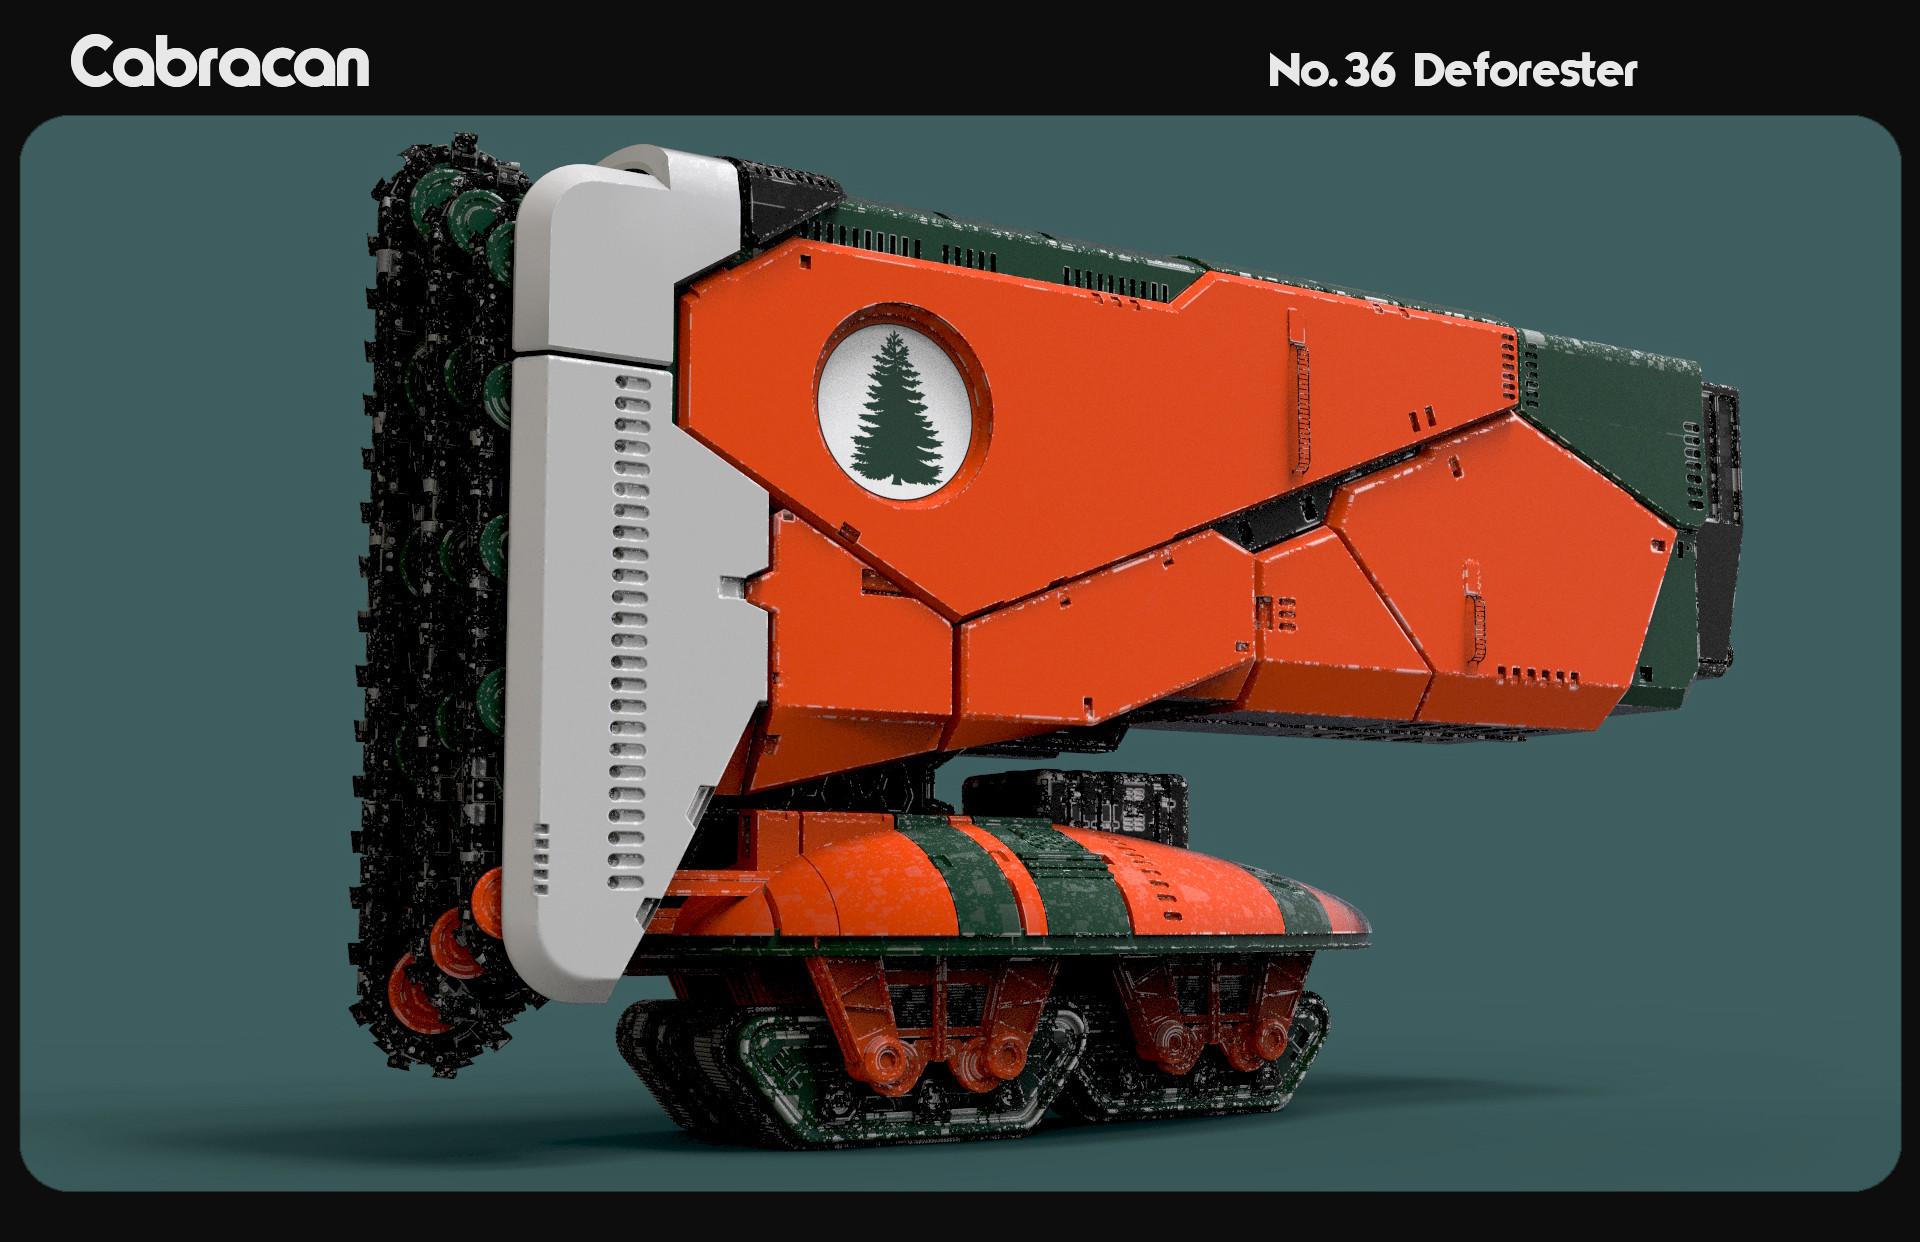 Benjamin nicholas cabracan final deforester 02